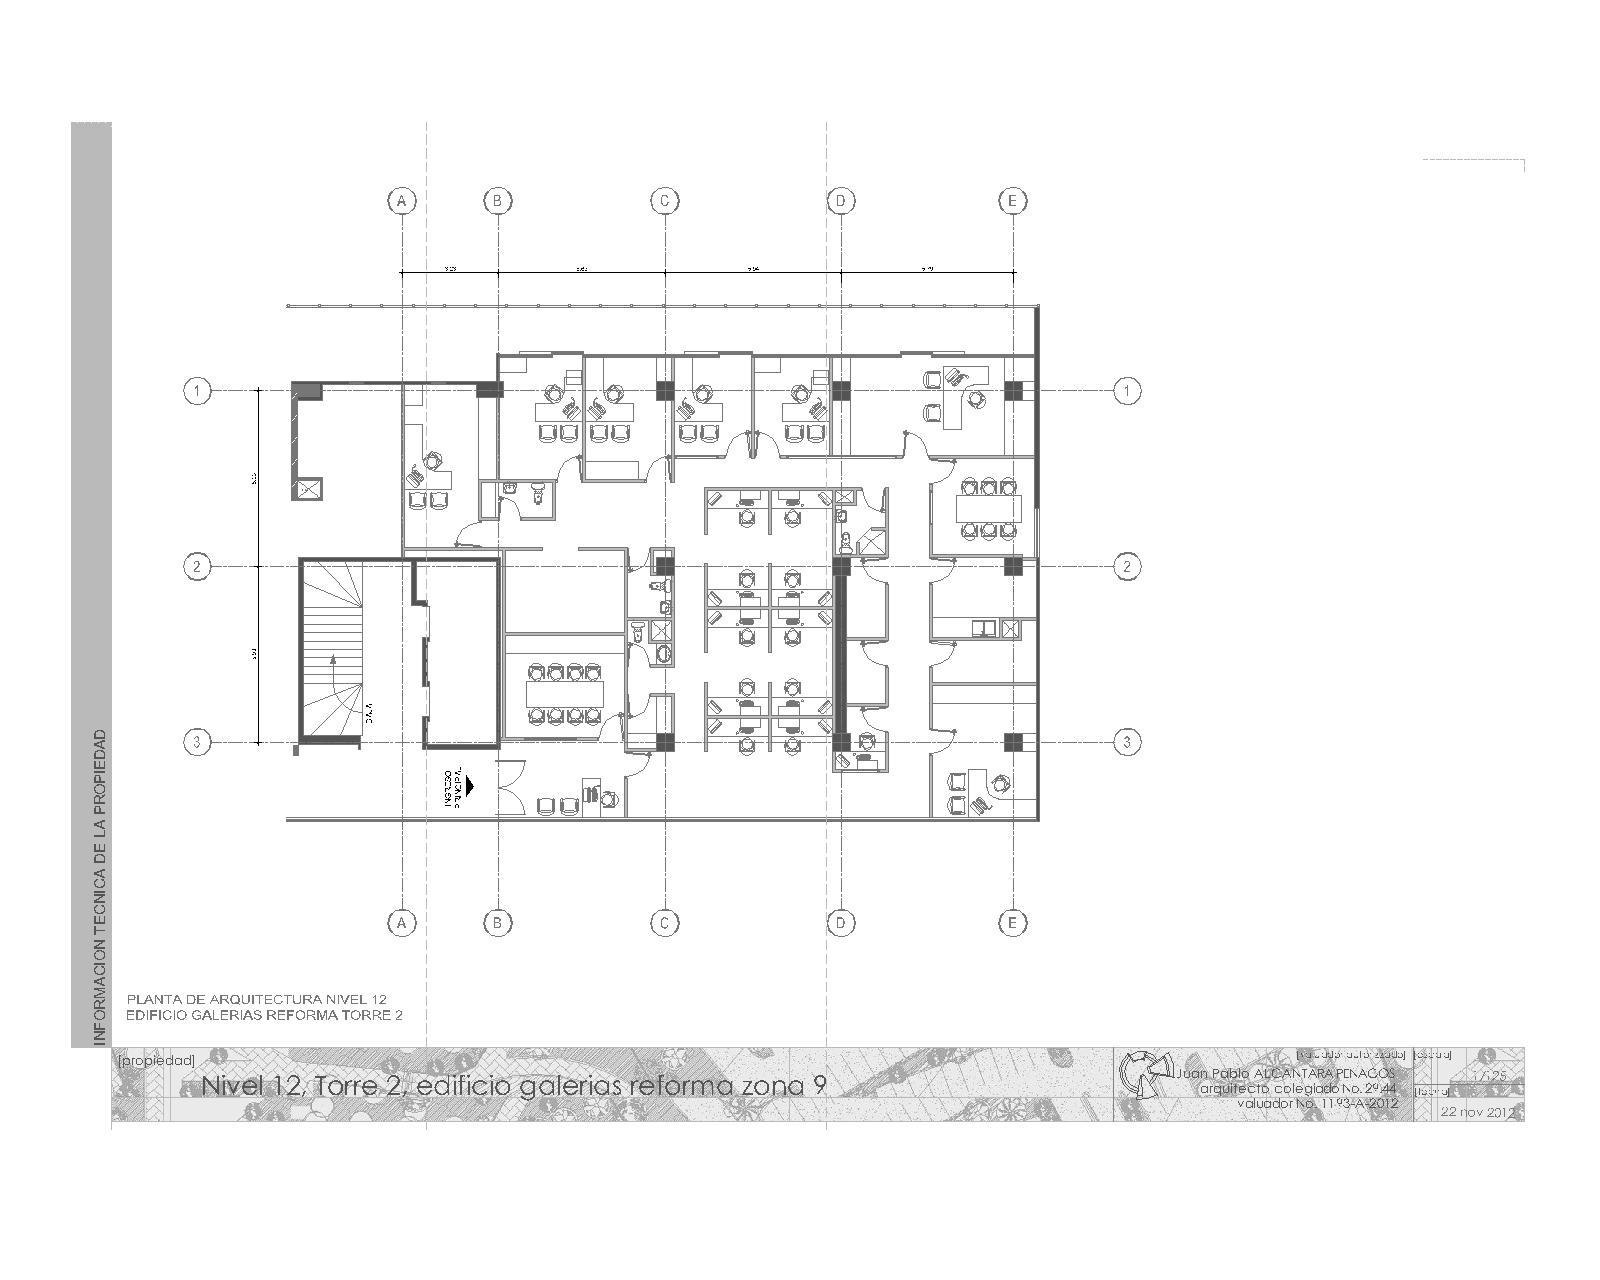 Pablo alc ntara penagos urbanismo y arquitectura for Plantas de oficinas arquitectura